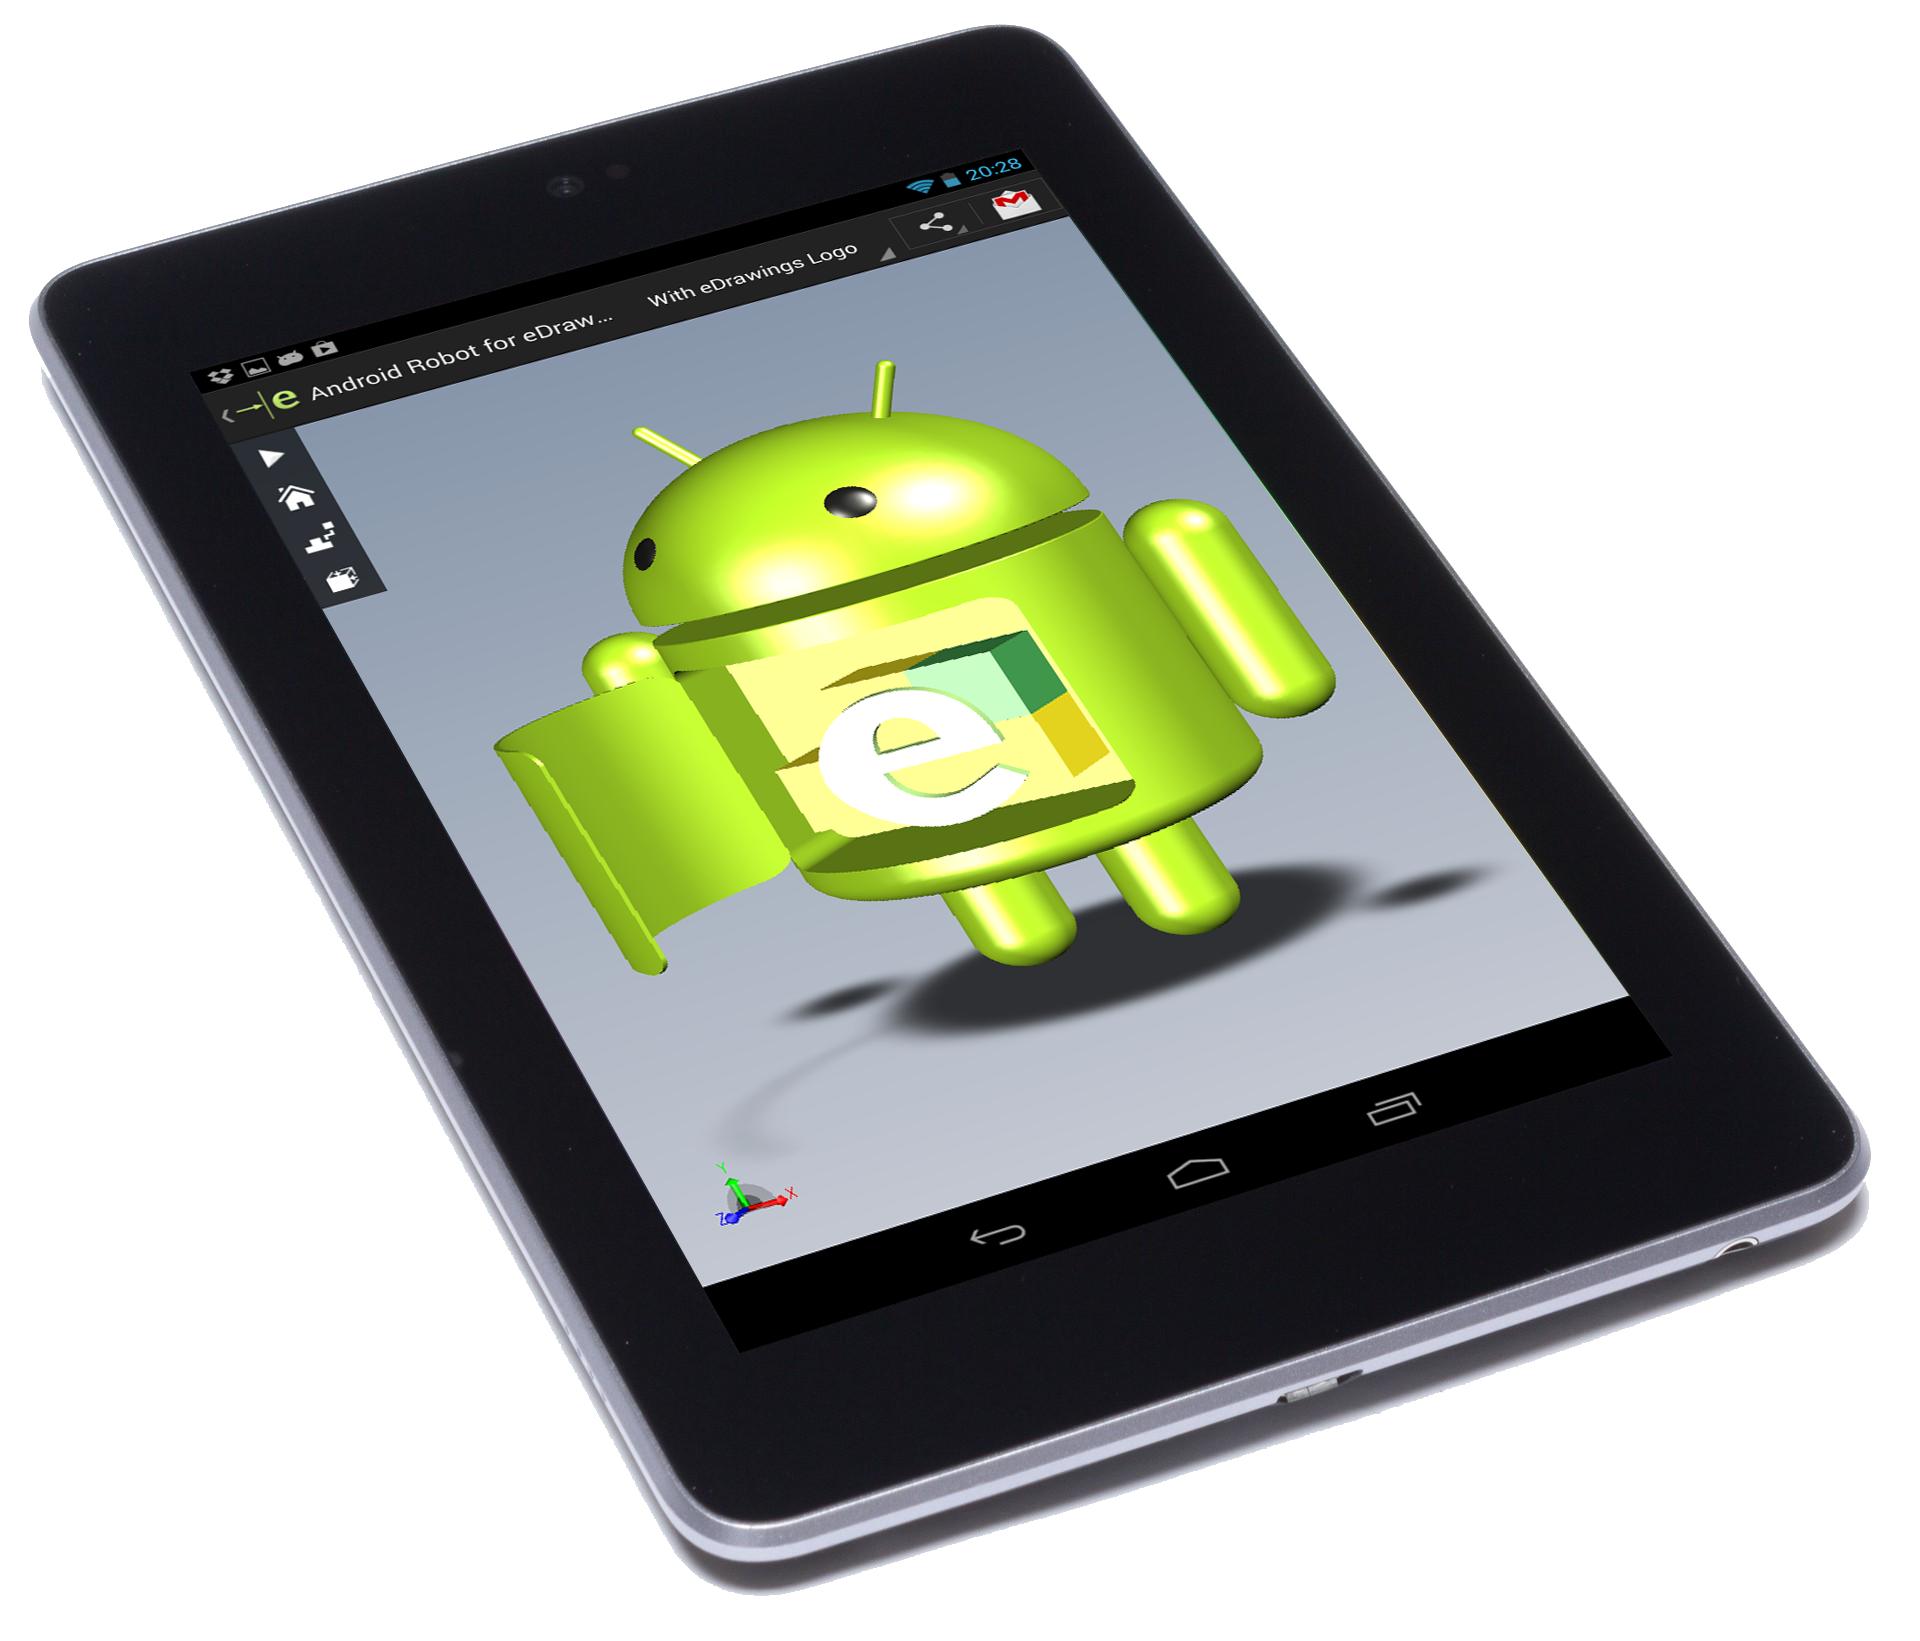 Apresentamos o eDrawings para Android